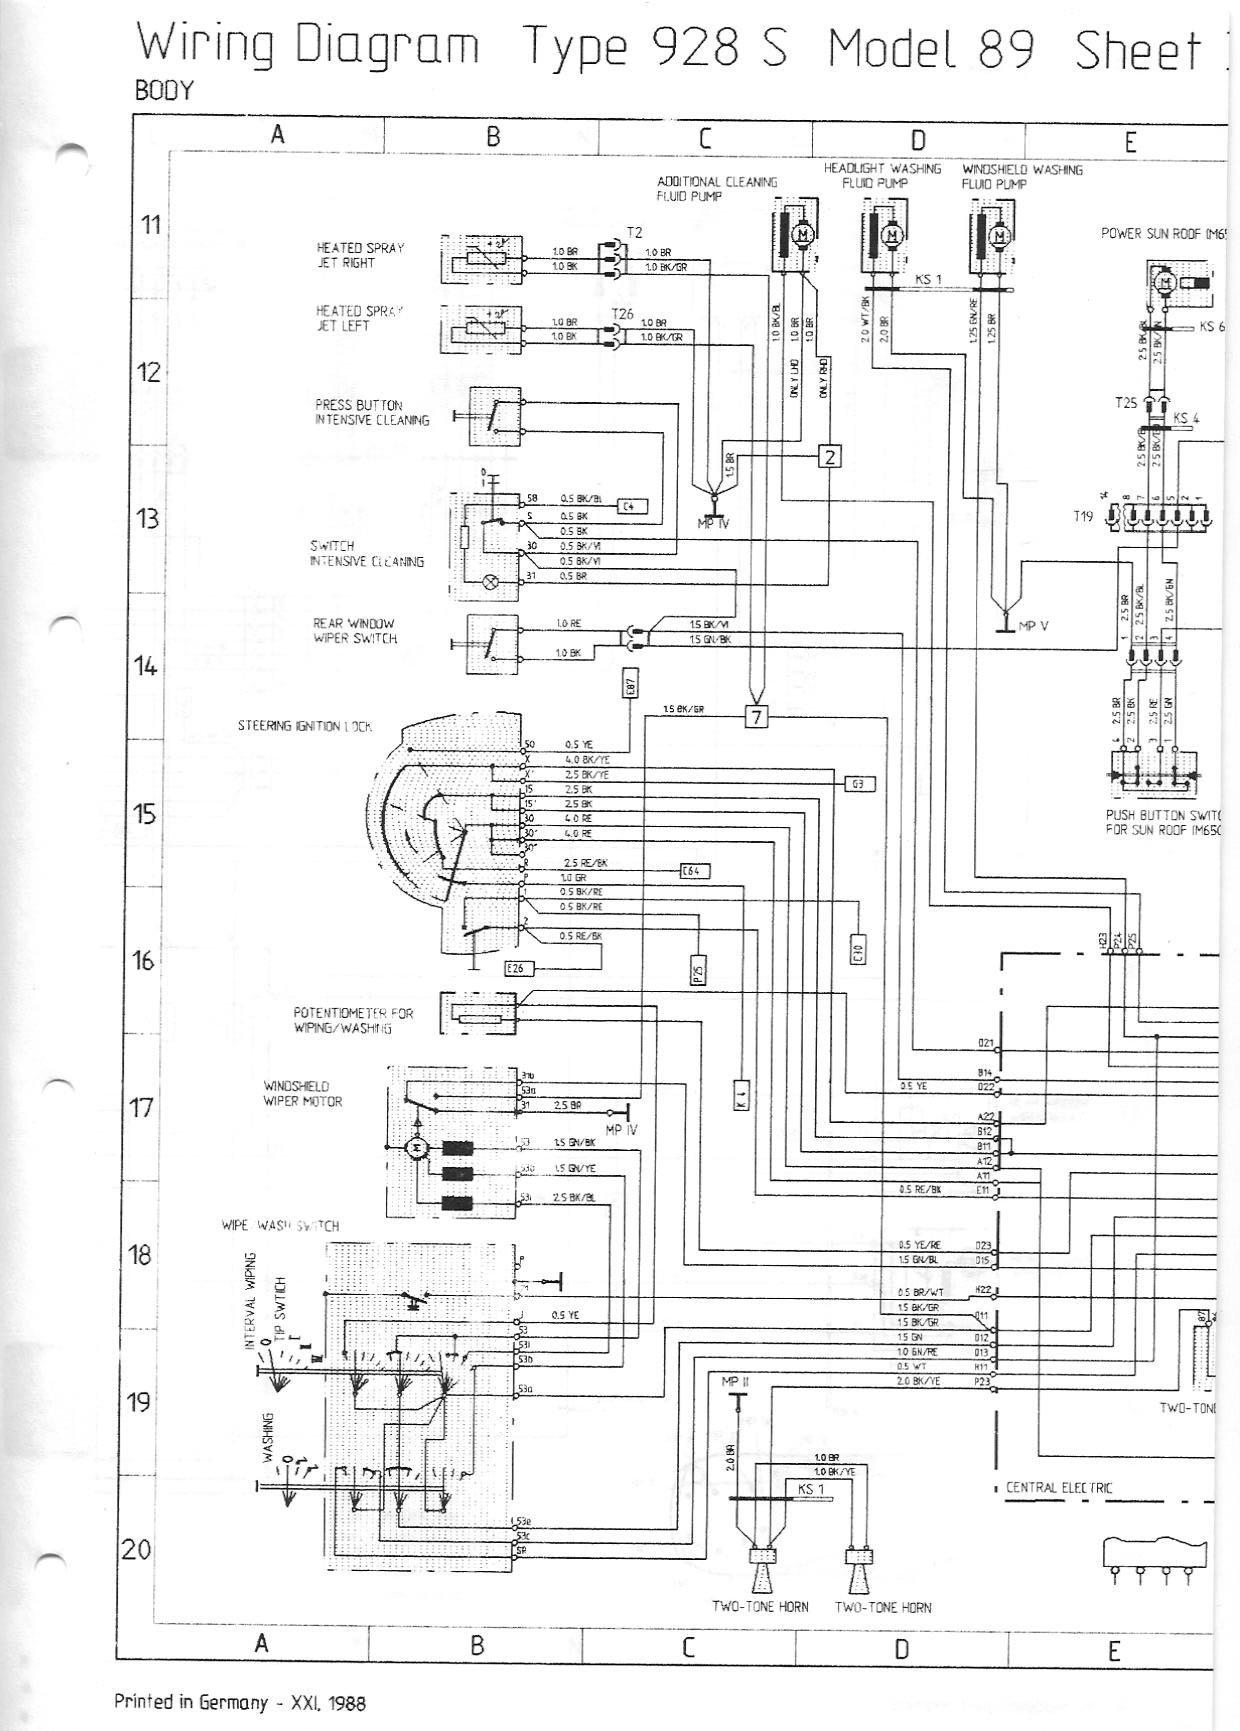 hight resolution of 1984 porsche 944 sunroof wiring diagram wiring diagram update 1984 porsche 944 fuse diagram 1984 porsche 944 sunroof wiring diagram